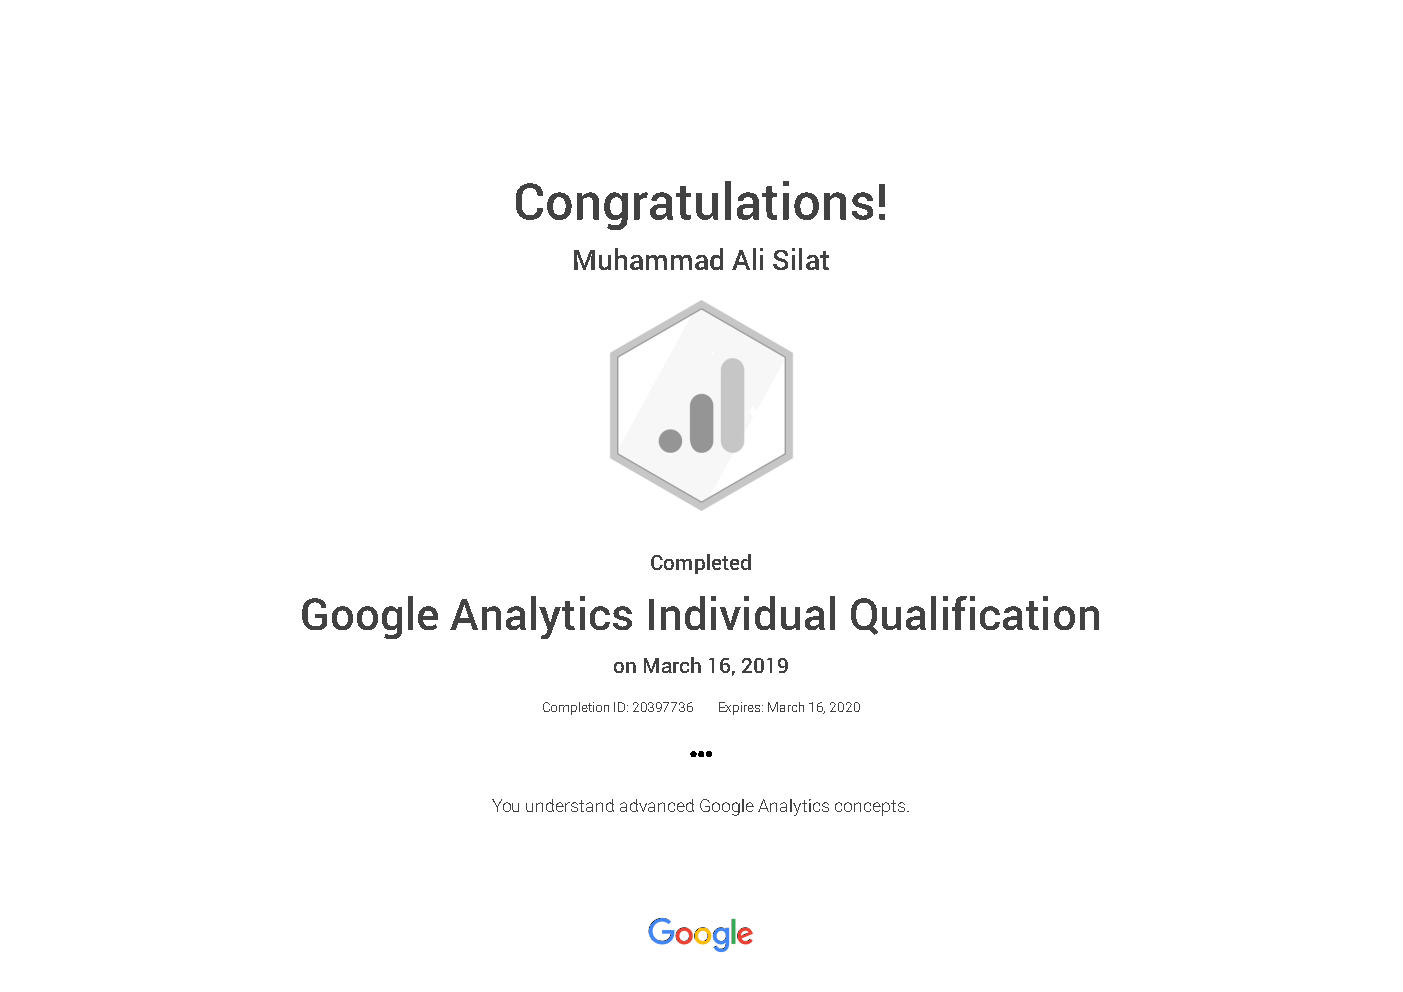 Google-Analytics-Individual-Qualification-_-Google.jpg